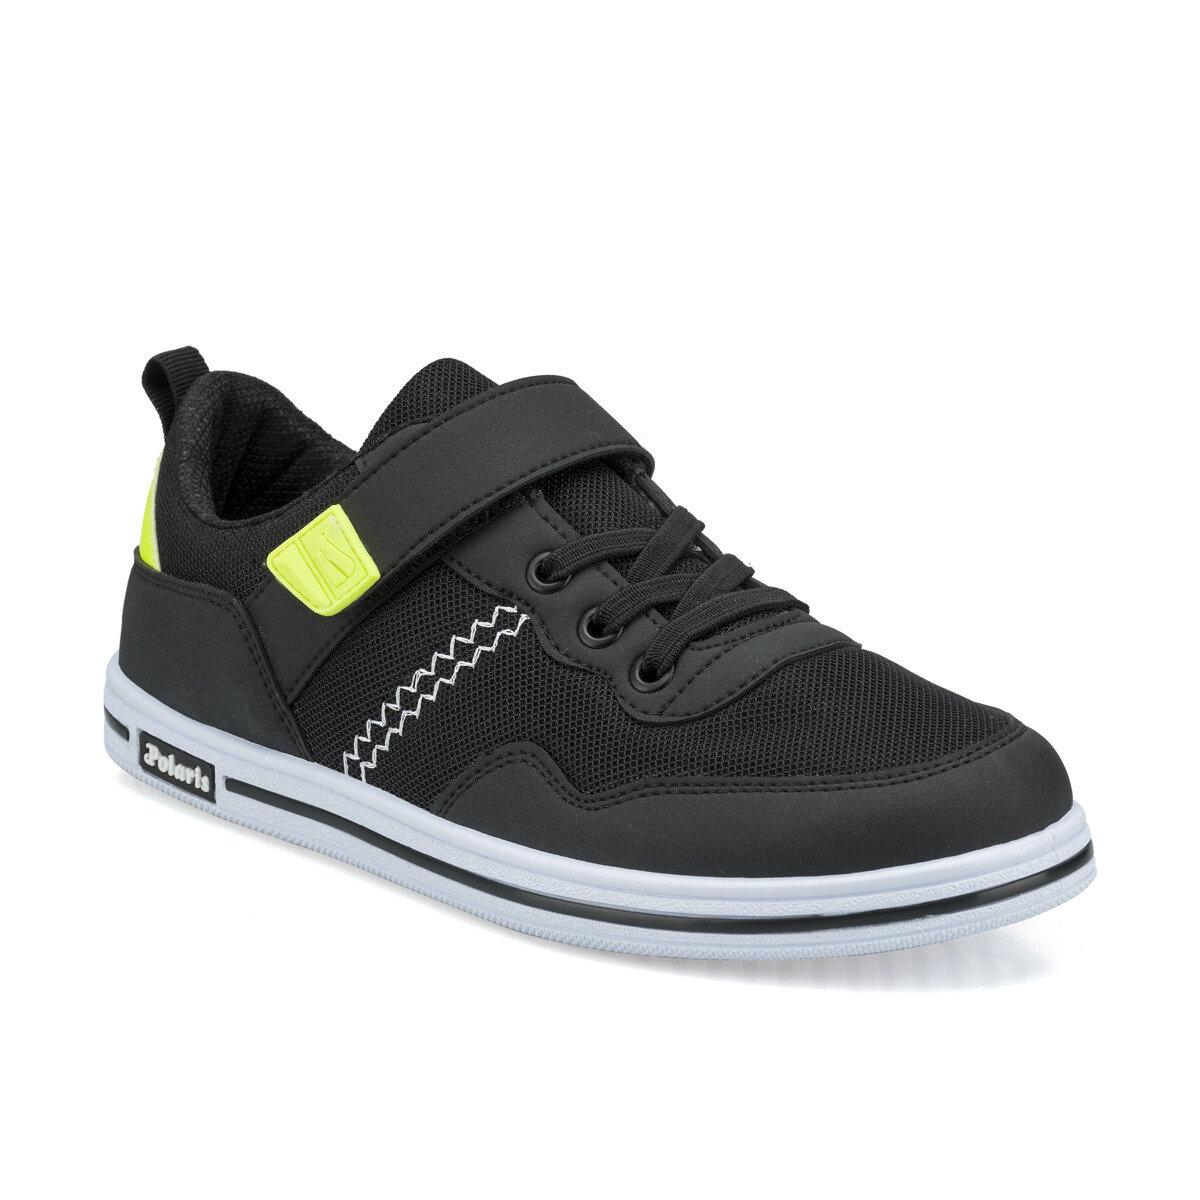 FLO 512532.G Gray Male Child Sneaker Shoes Polaris